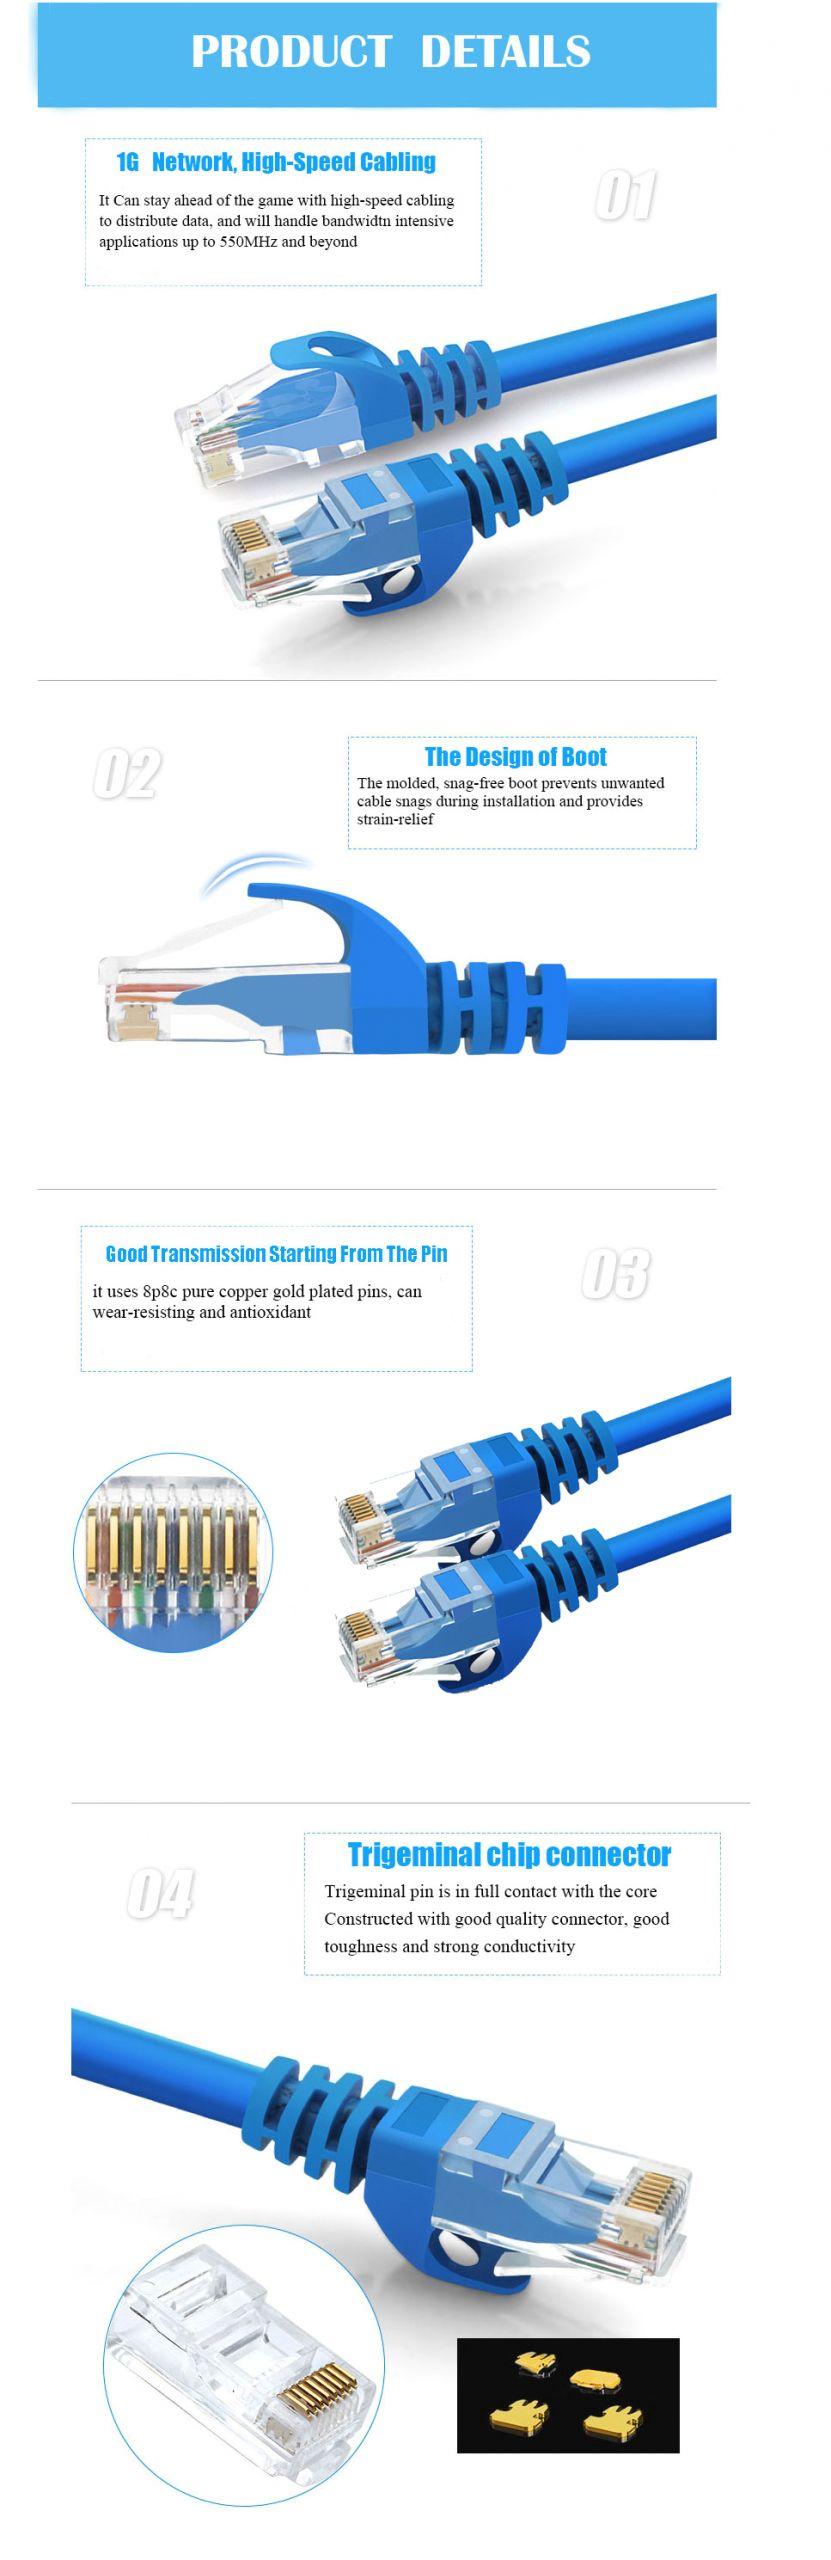 Ce Tech Cat6 Jack Wiring Diagram Runde Wohnung Cat5e Cat6 Rj45 Patchkabel Ethernet Netzwerkkabel 3 Mt Patchkabel Preis Buy Patchkabel Fiber Optic Lan Patchkabel Sfp Patchkabel Drop